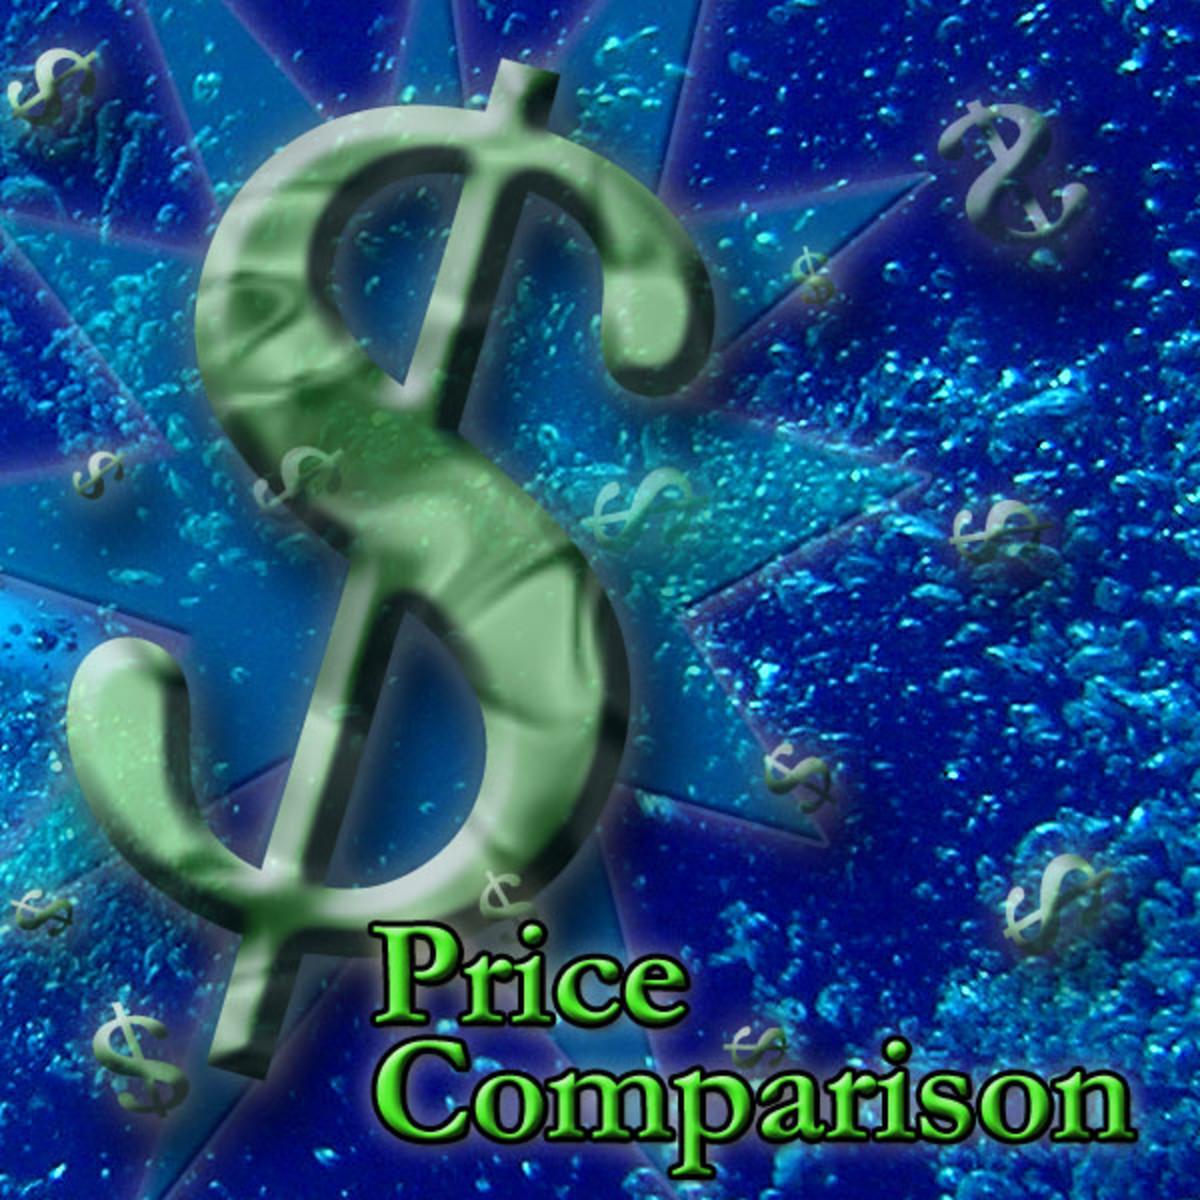 H2O price comparison winner: Trader Joe's!